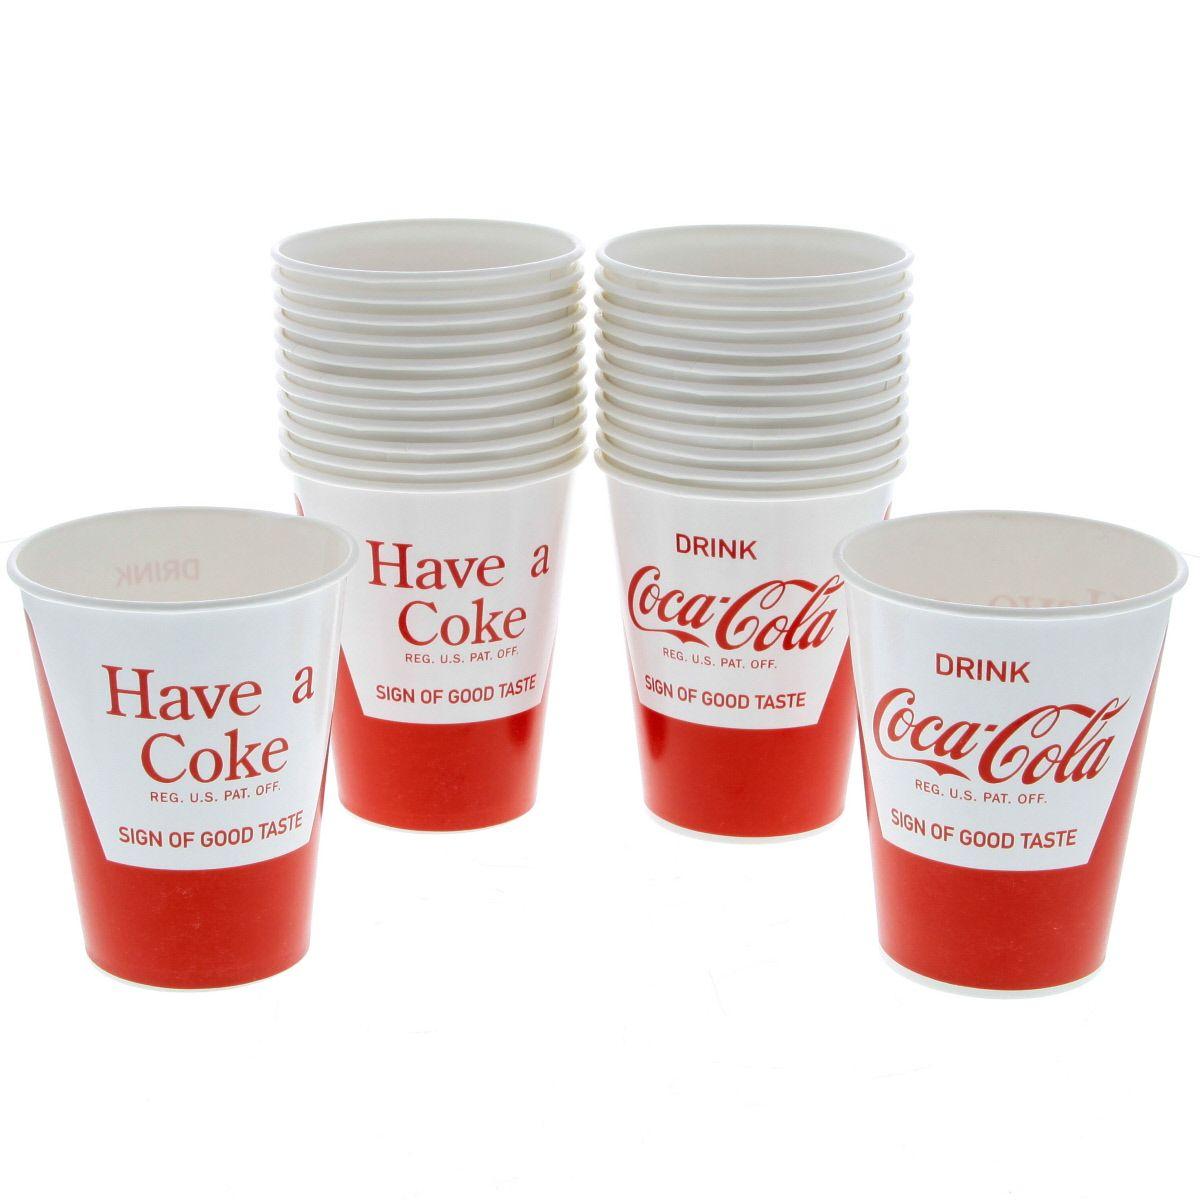 Coca-Cola Soda Fountain Paper Cups 24 Pack | Diner Serveware | RetroPlanet.com